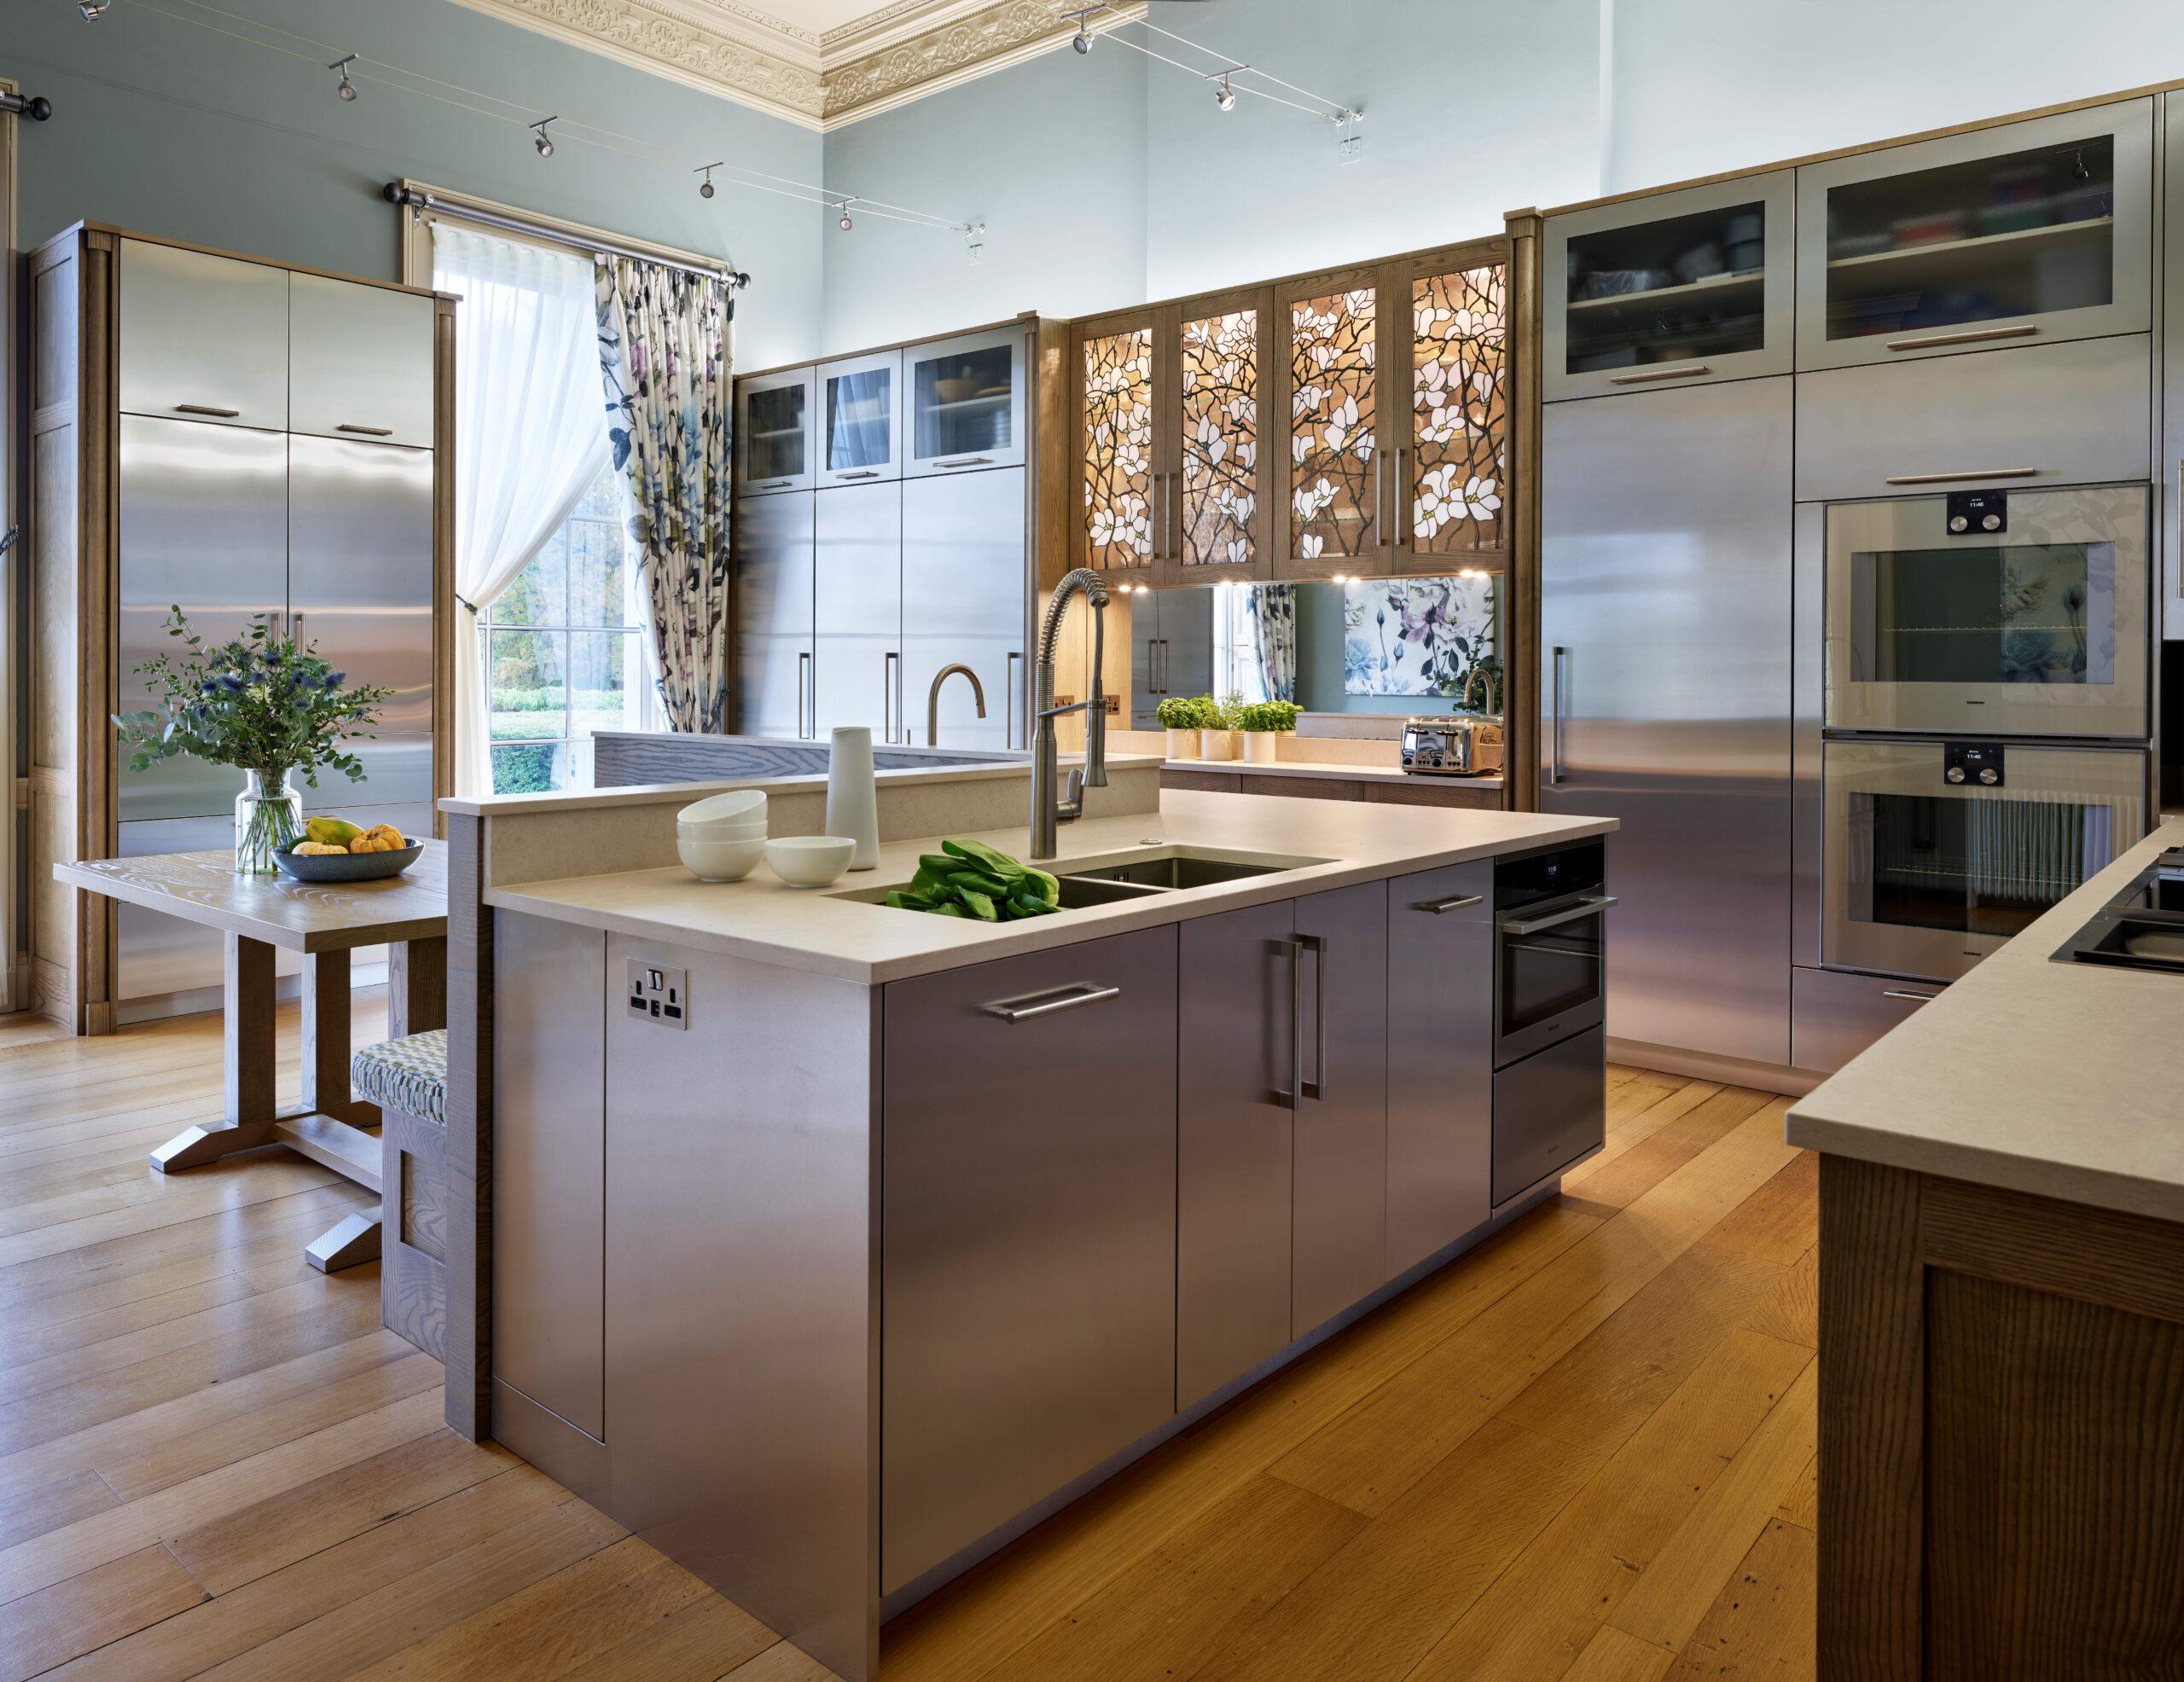 Simon Taylor Furniture - Purley - Kitchen Island